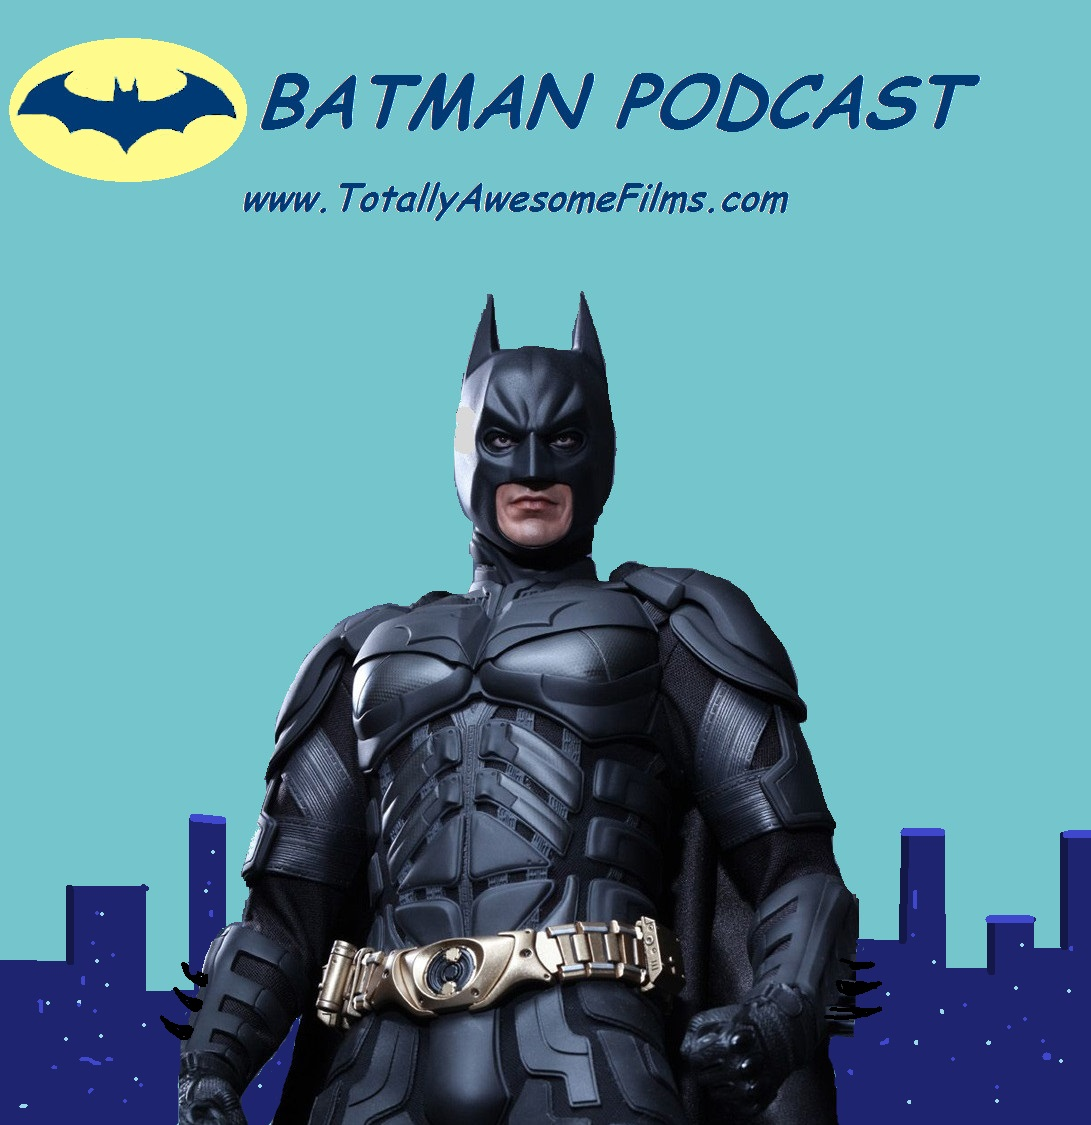 BatmanLOGO for PodcastFINAL.jpg